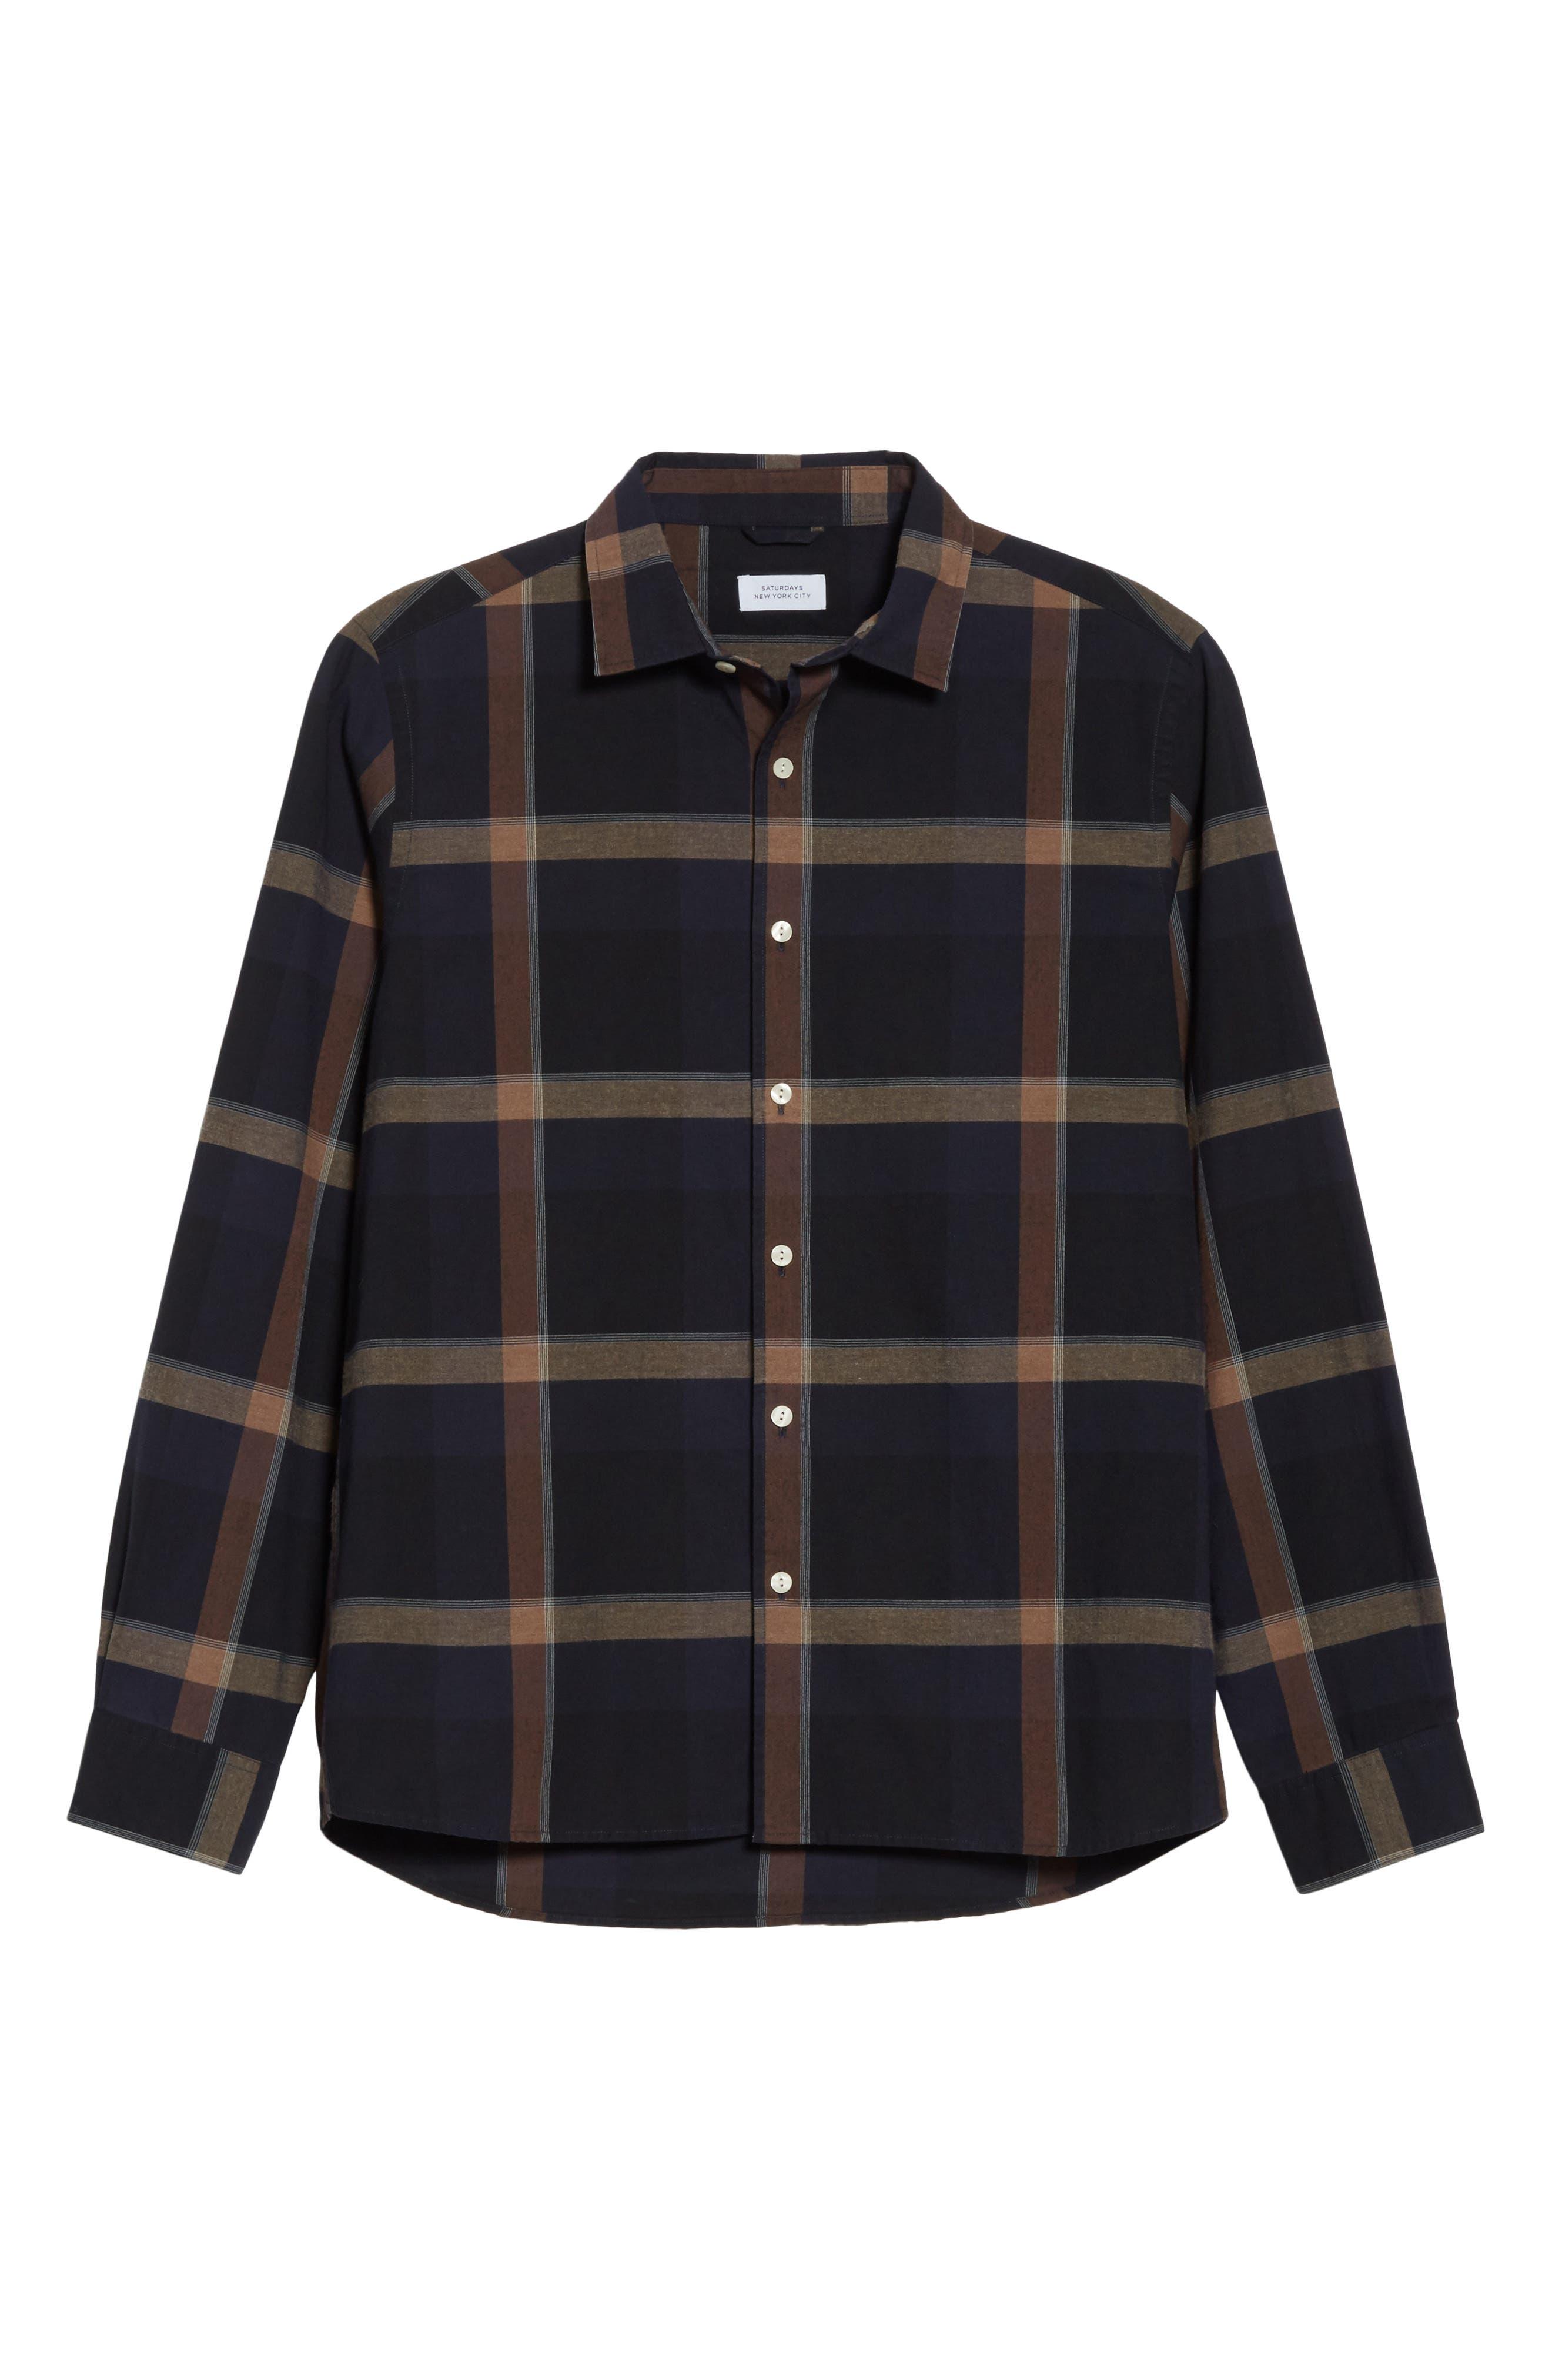 Laslo Check Shirt,                             Alternate thumbnail 6, color,                             225